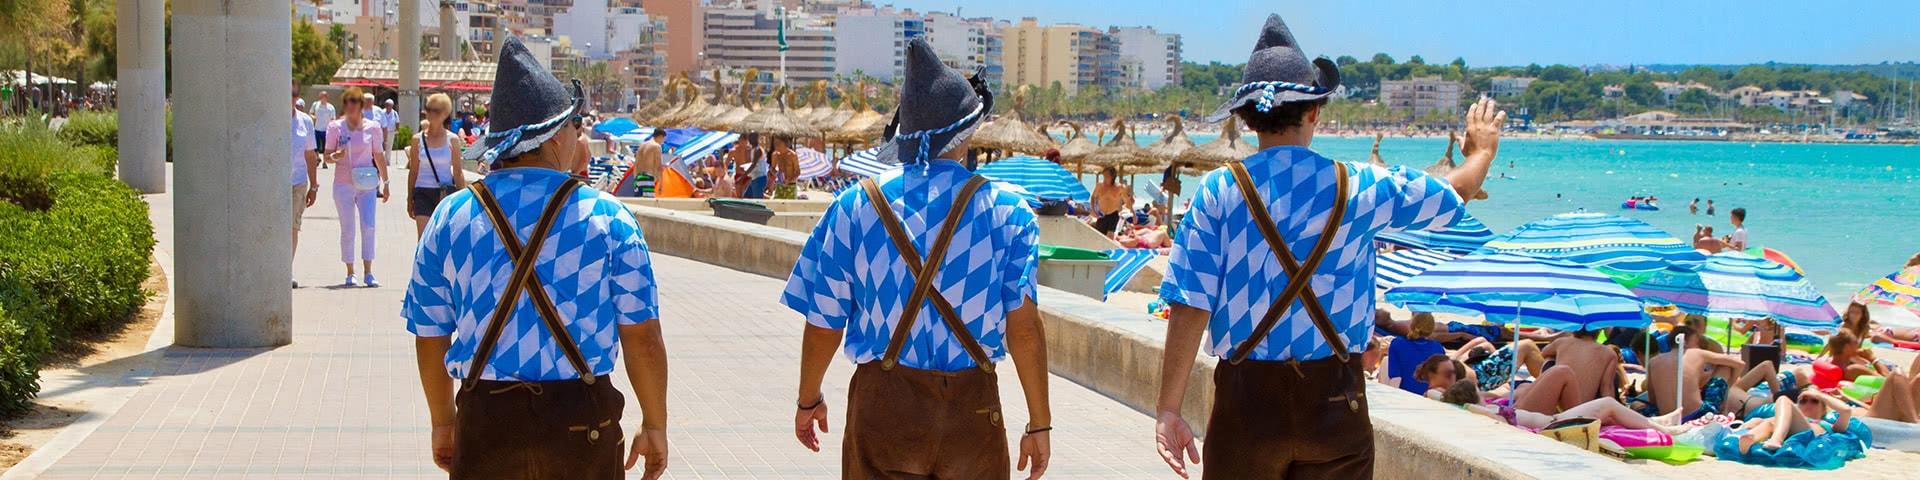 Drei Männer im Bayern-Outfit an der Strandpromenade auf Mallorca